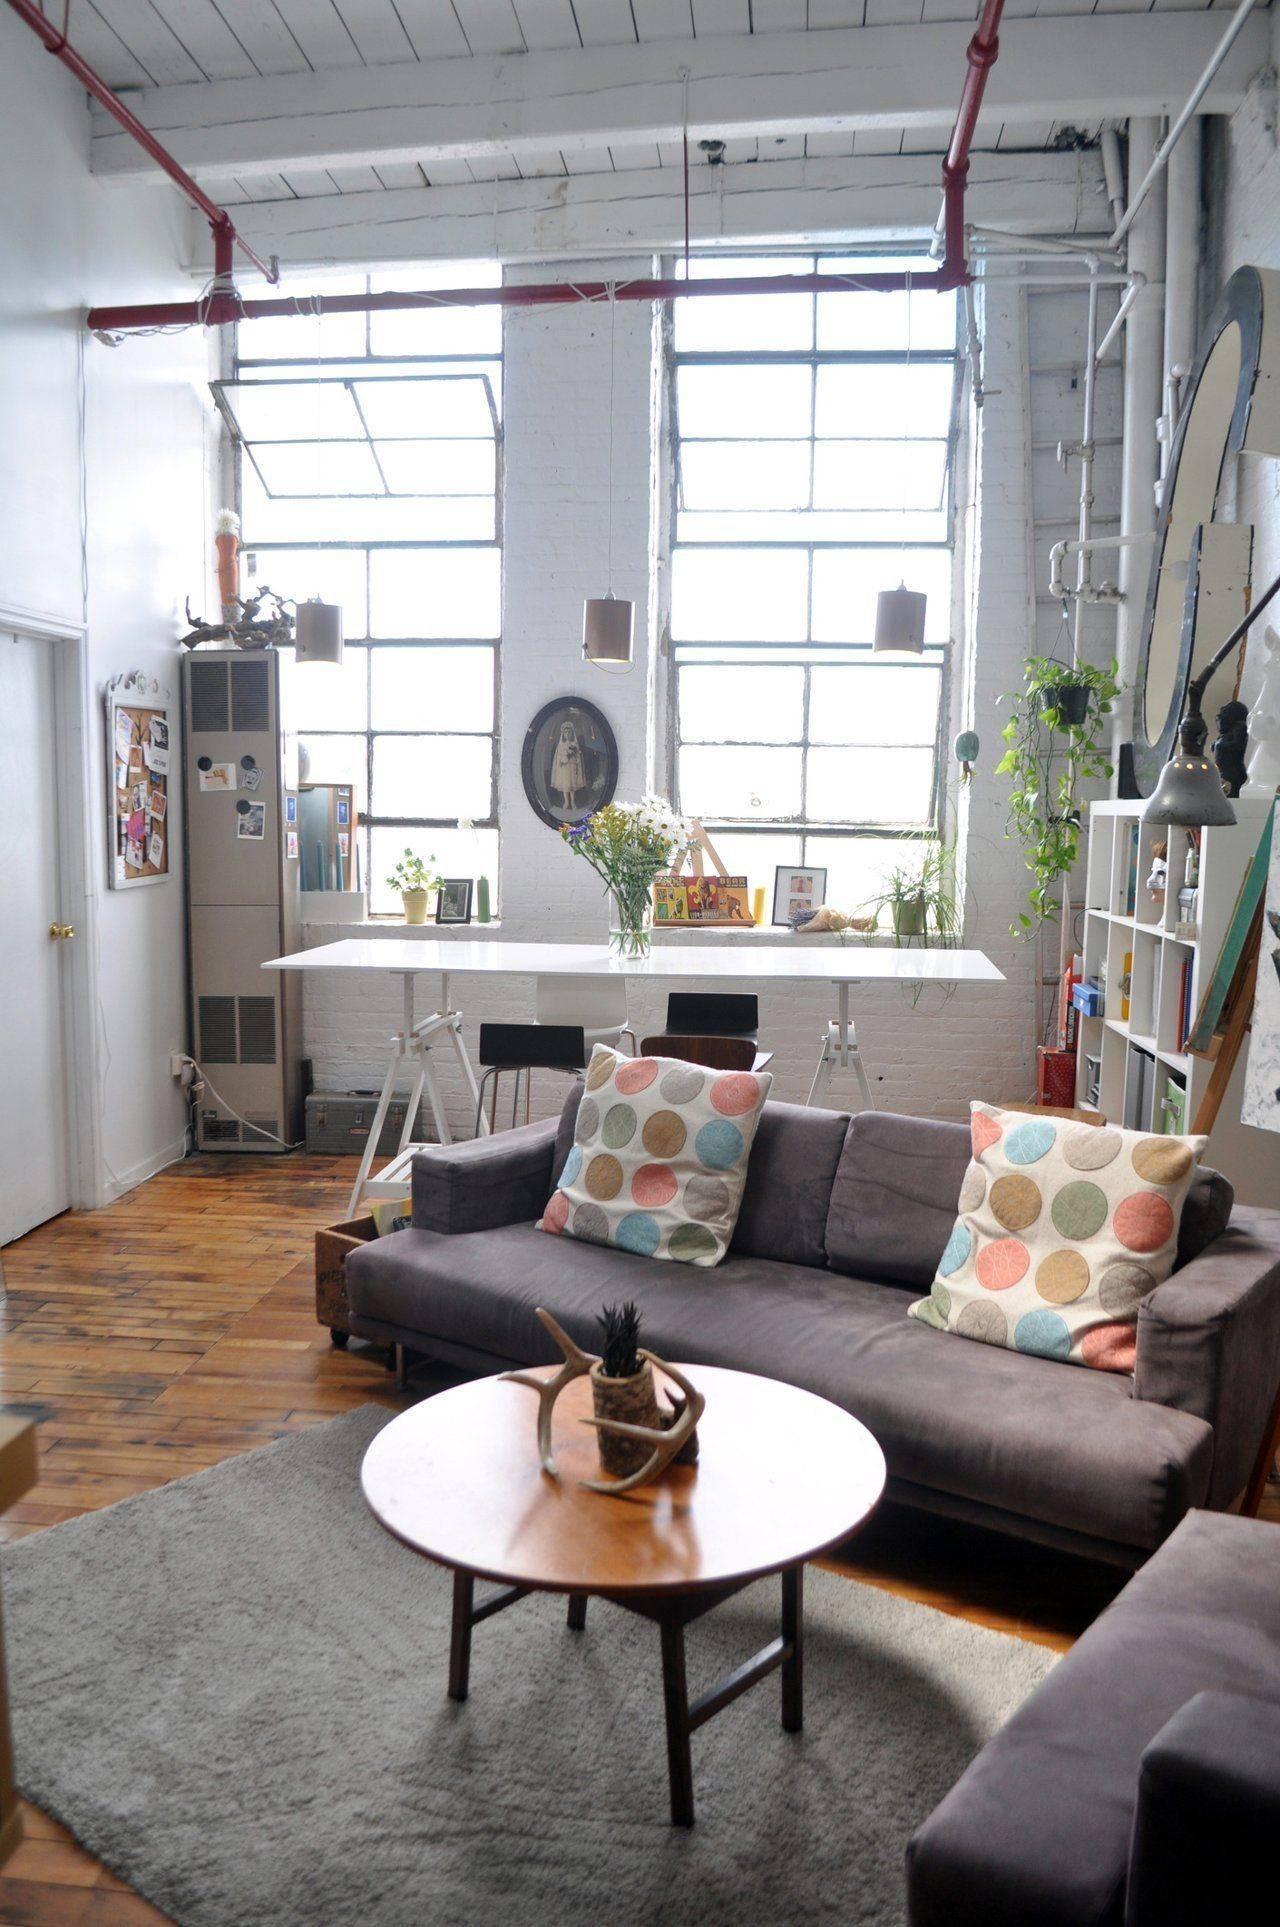 apartment loft decor ideas luxury ryan s artist loft in bushwick apartment interiors of apartment loft decor ideas